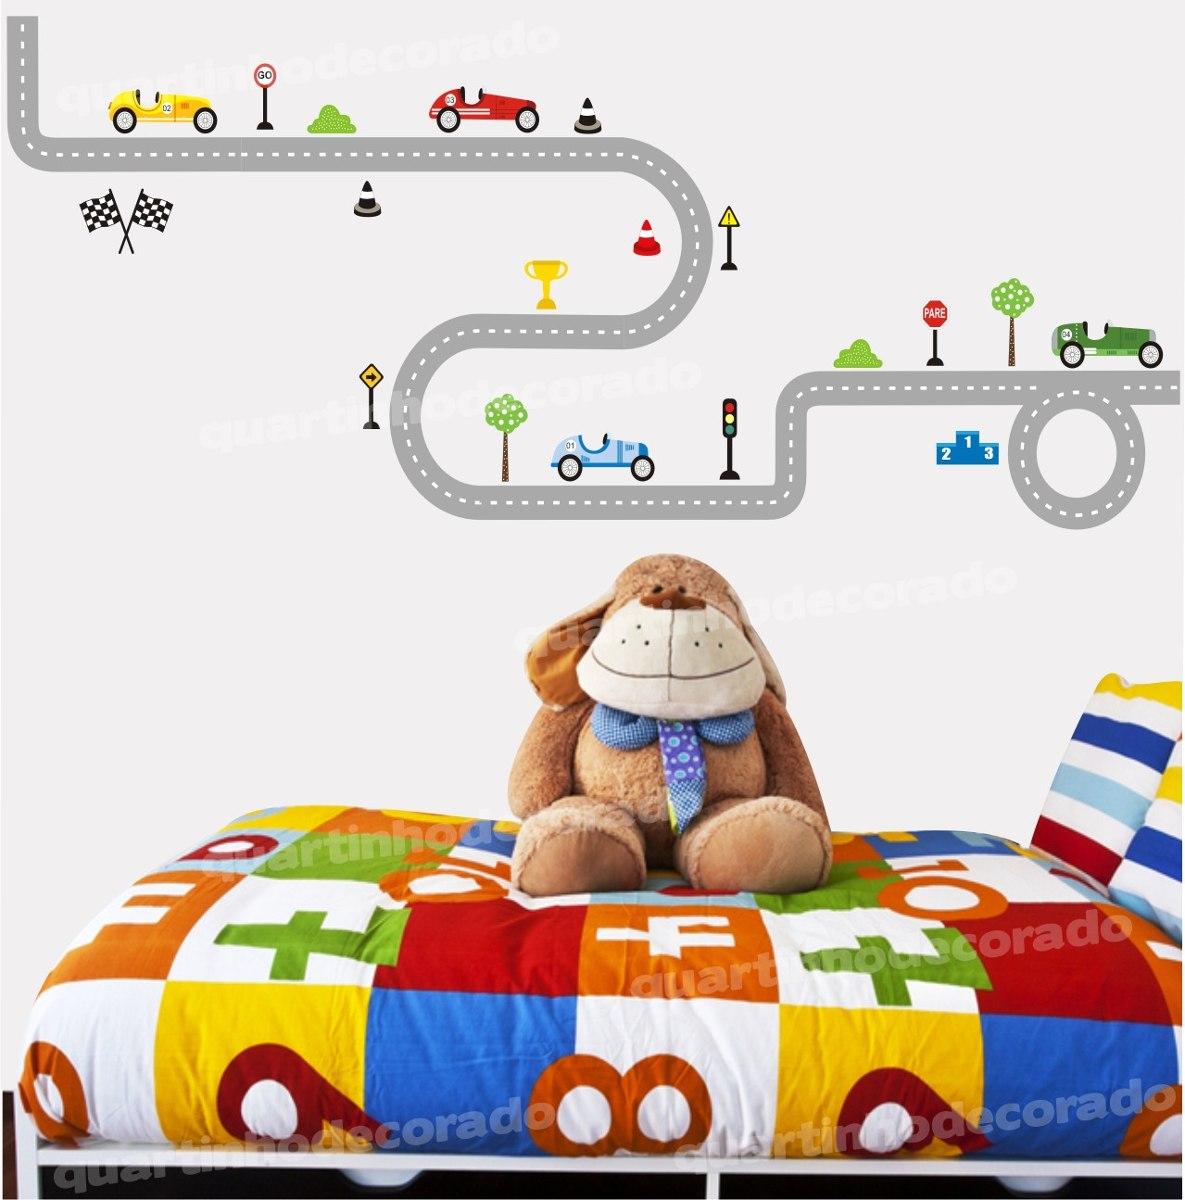 Adesivo Parede Infantil Decorativo Pista Carros Menino  ~ Adesivo De Parede Quarto Infantil Carros